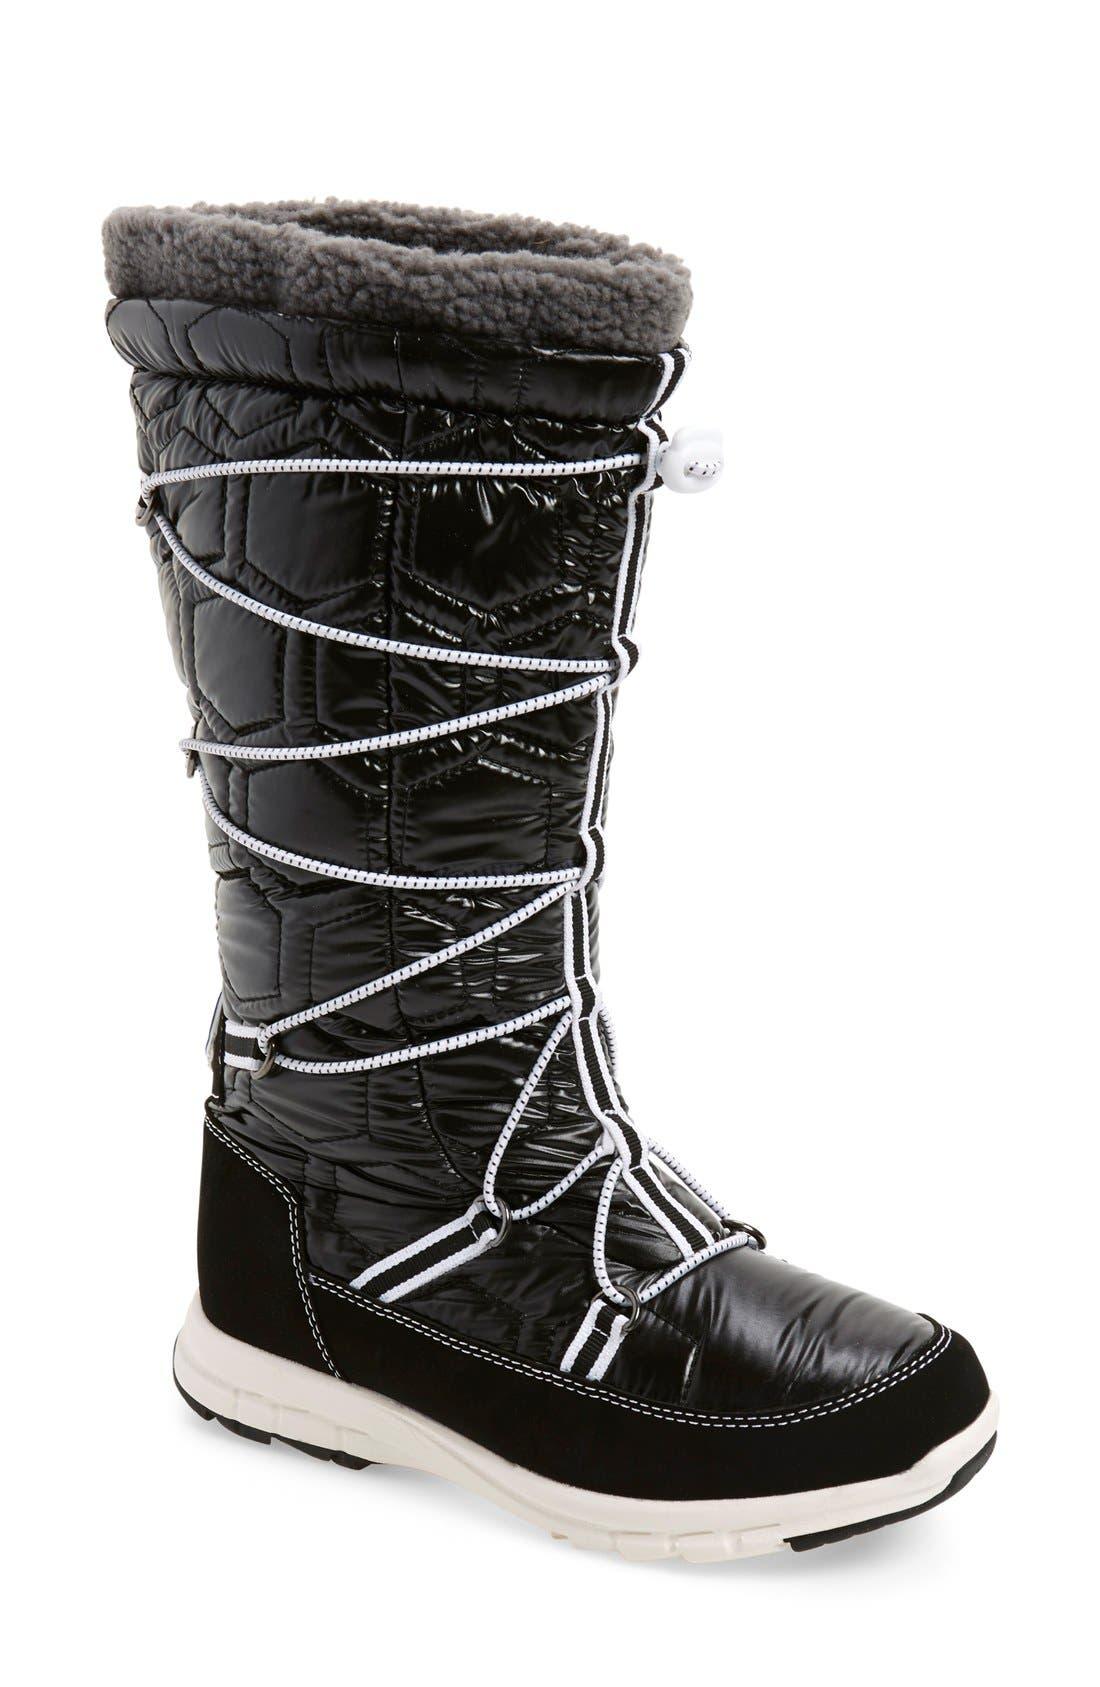 Main Image - Khombu 'Slalom' Tall Waterproof Boot (Women)